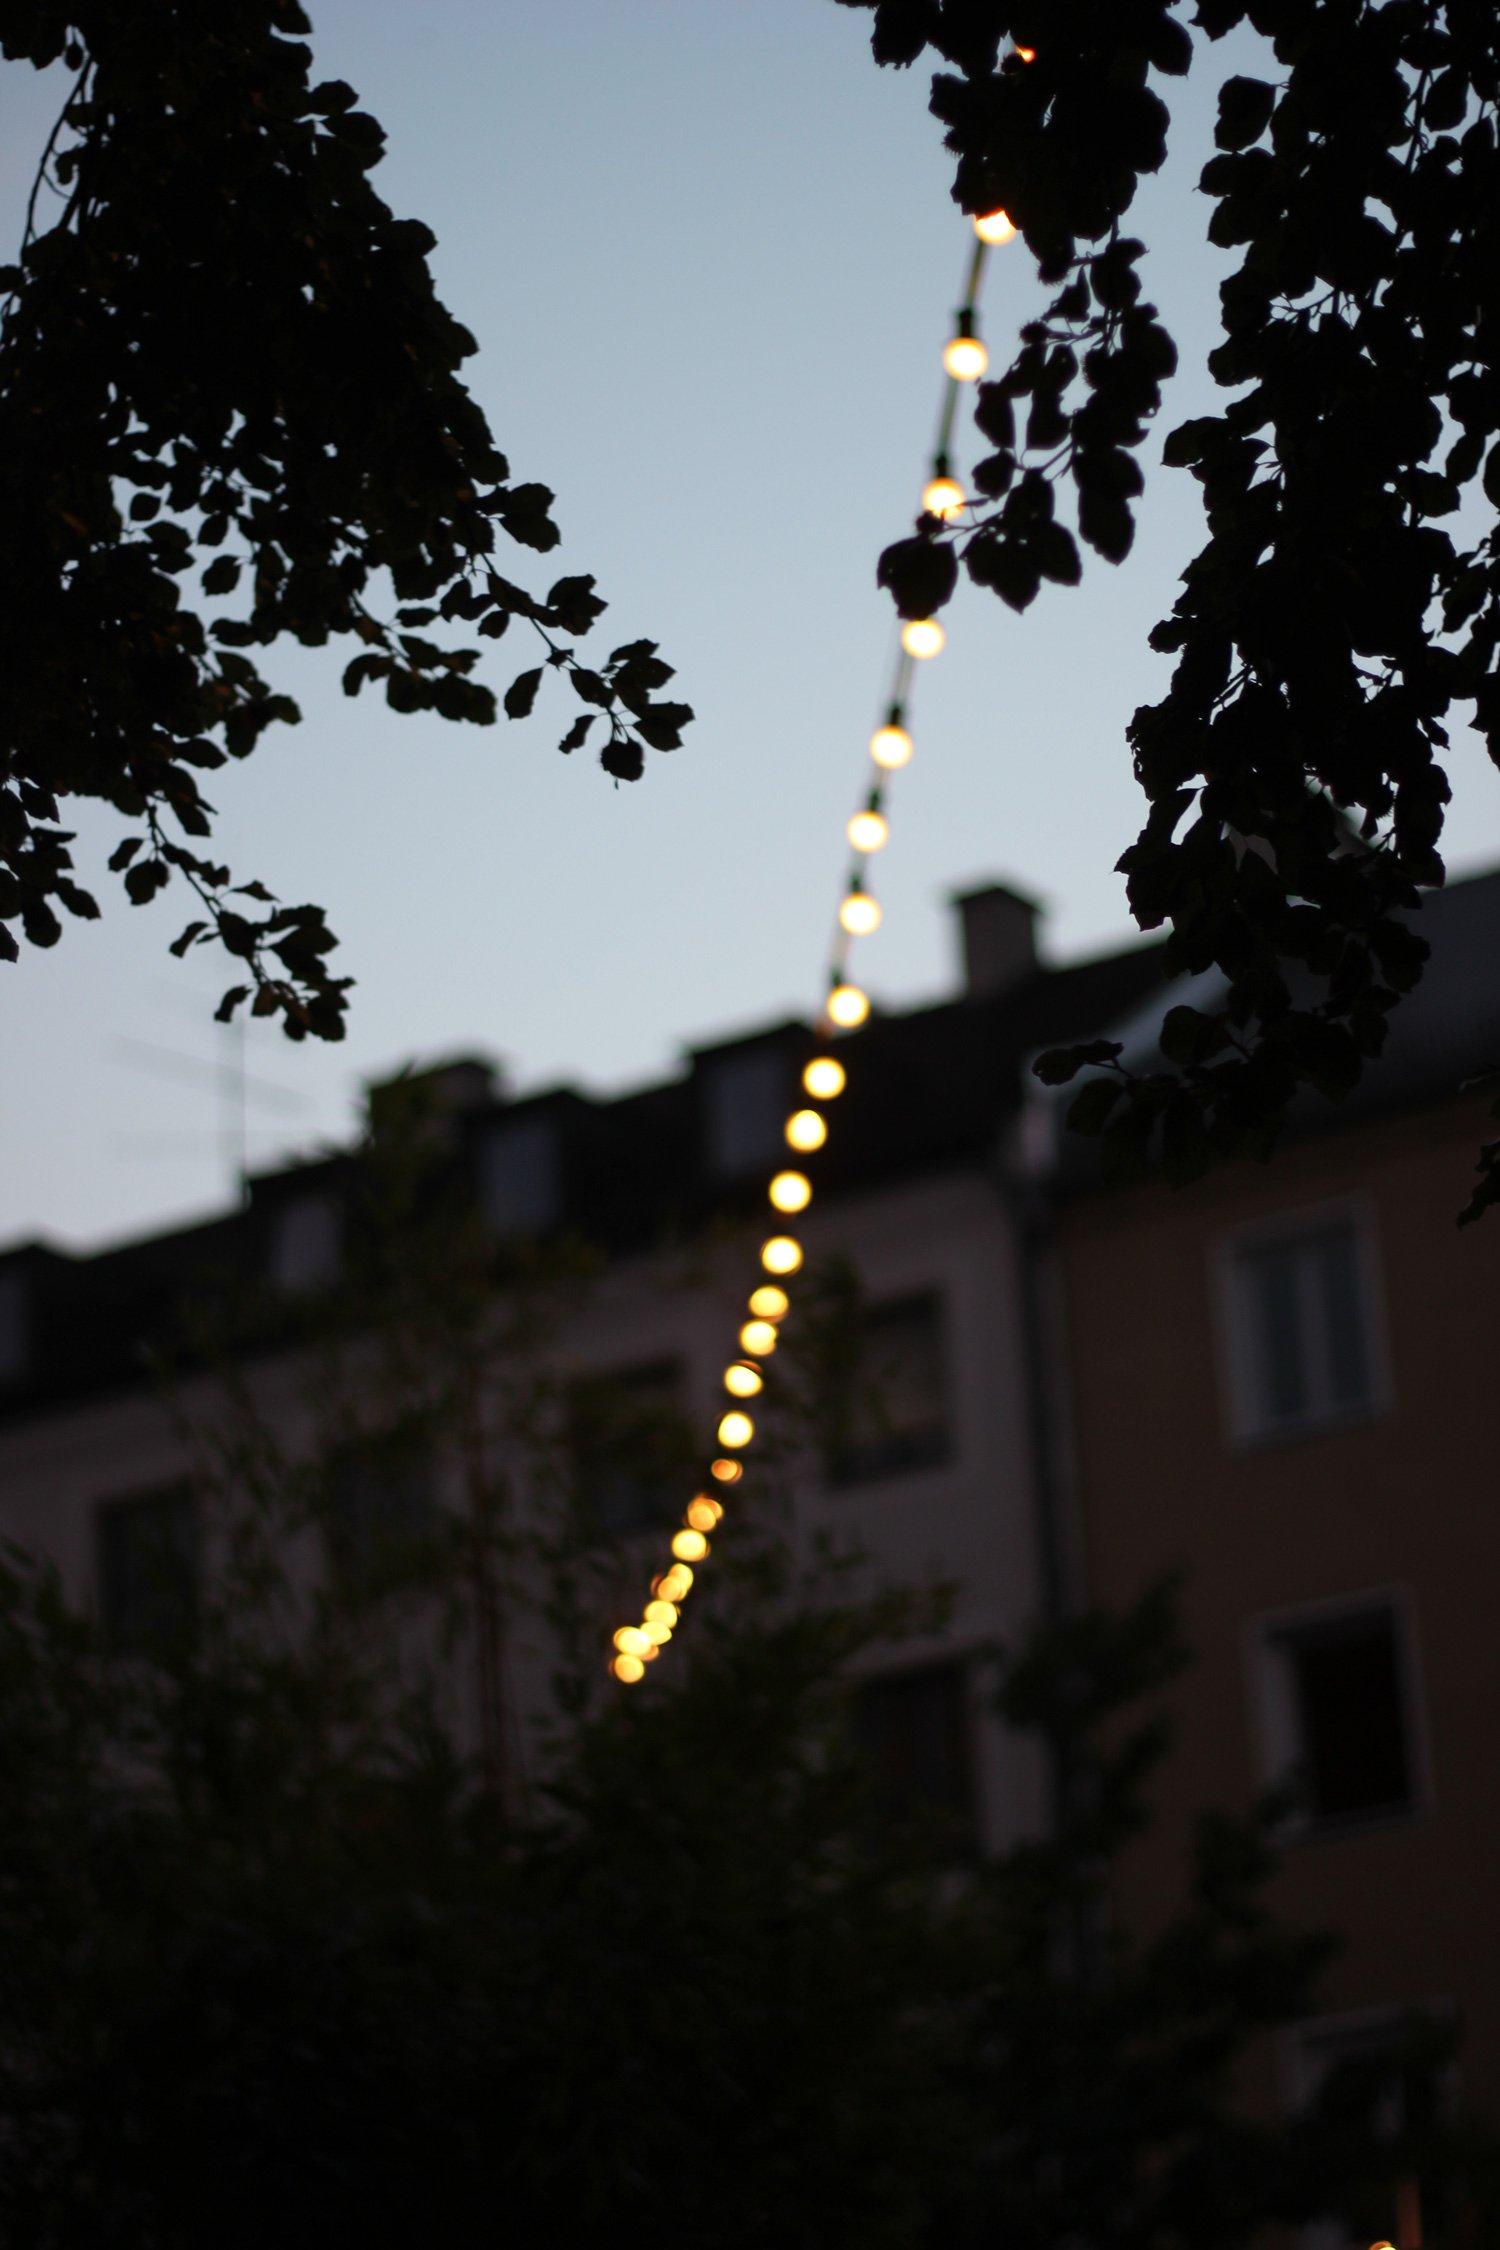 Lichterkette, Boulangerie Bleue, Cafe Reitschule, Munichblogger, Conny Doll